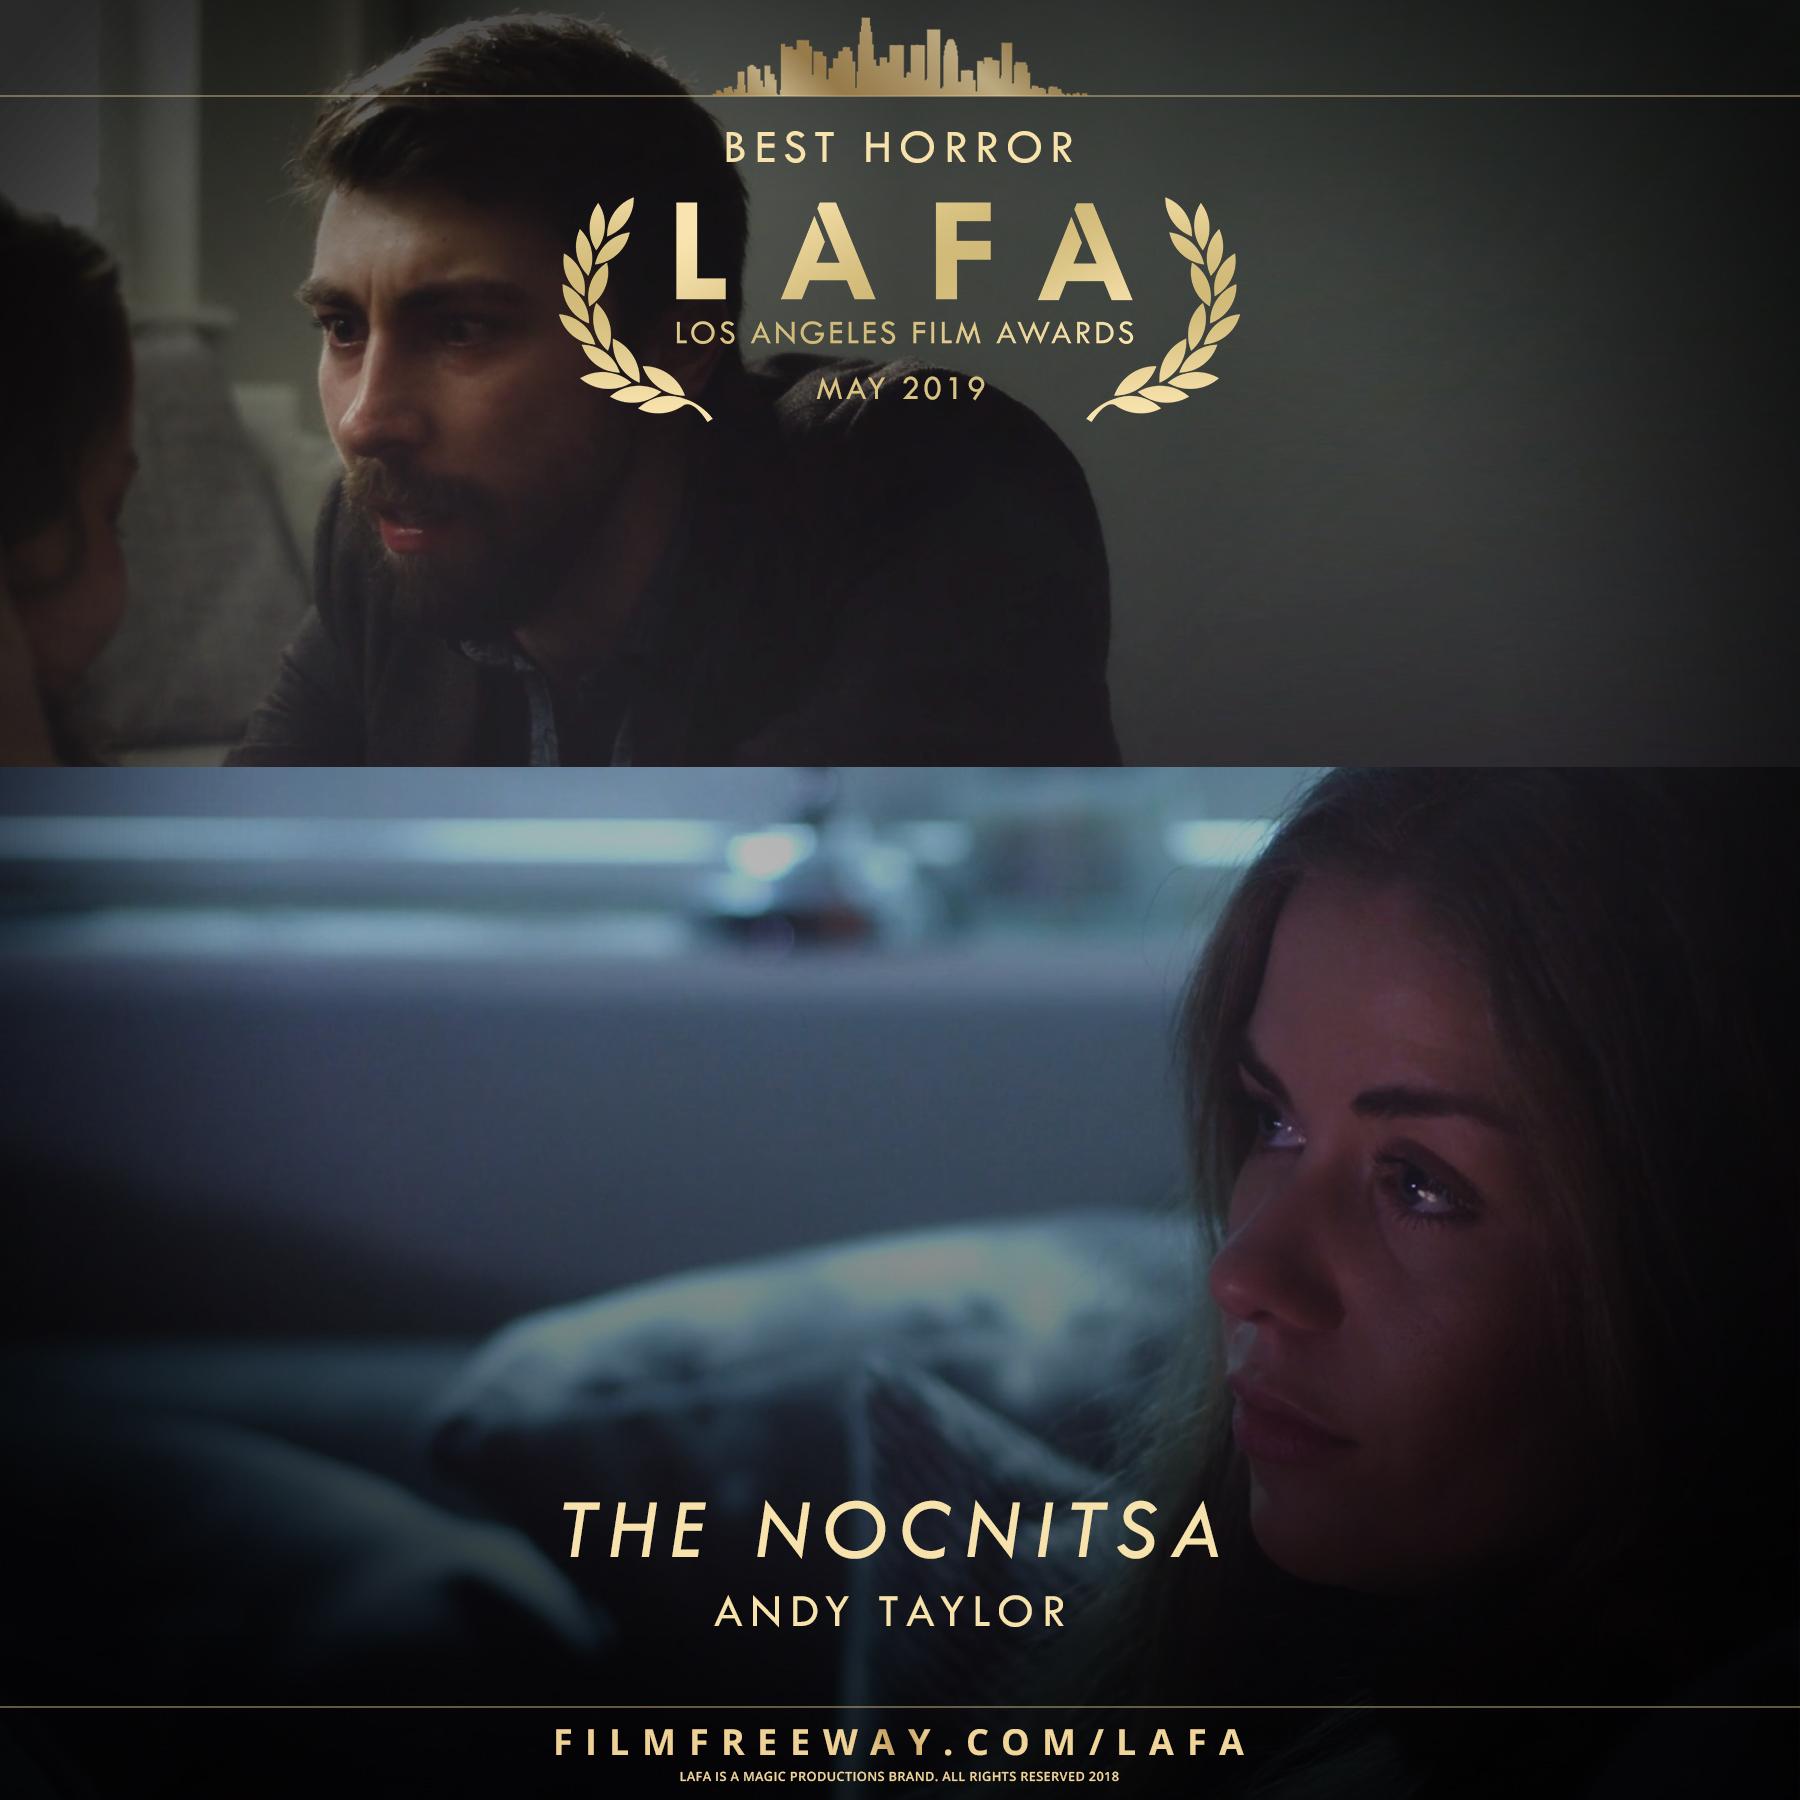 THE NOCNITSA design